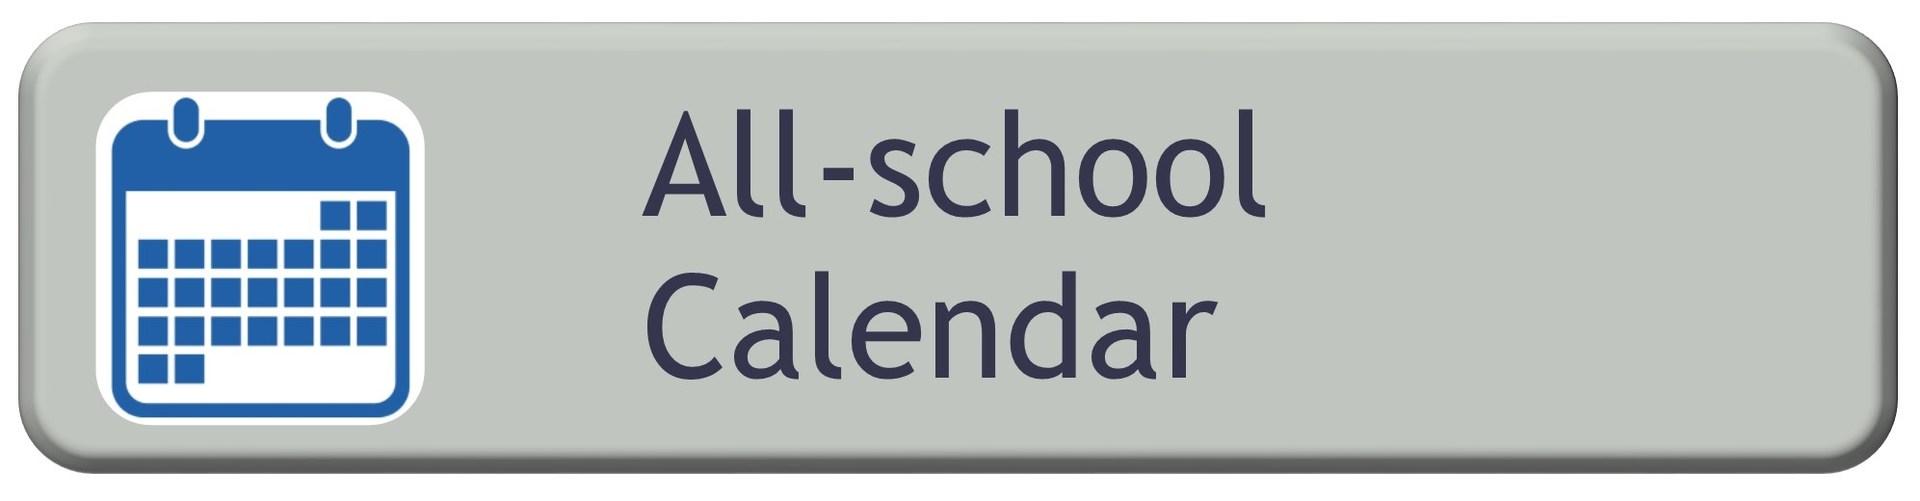 All-school Calendar